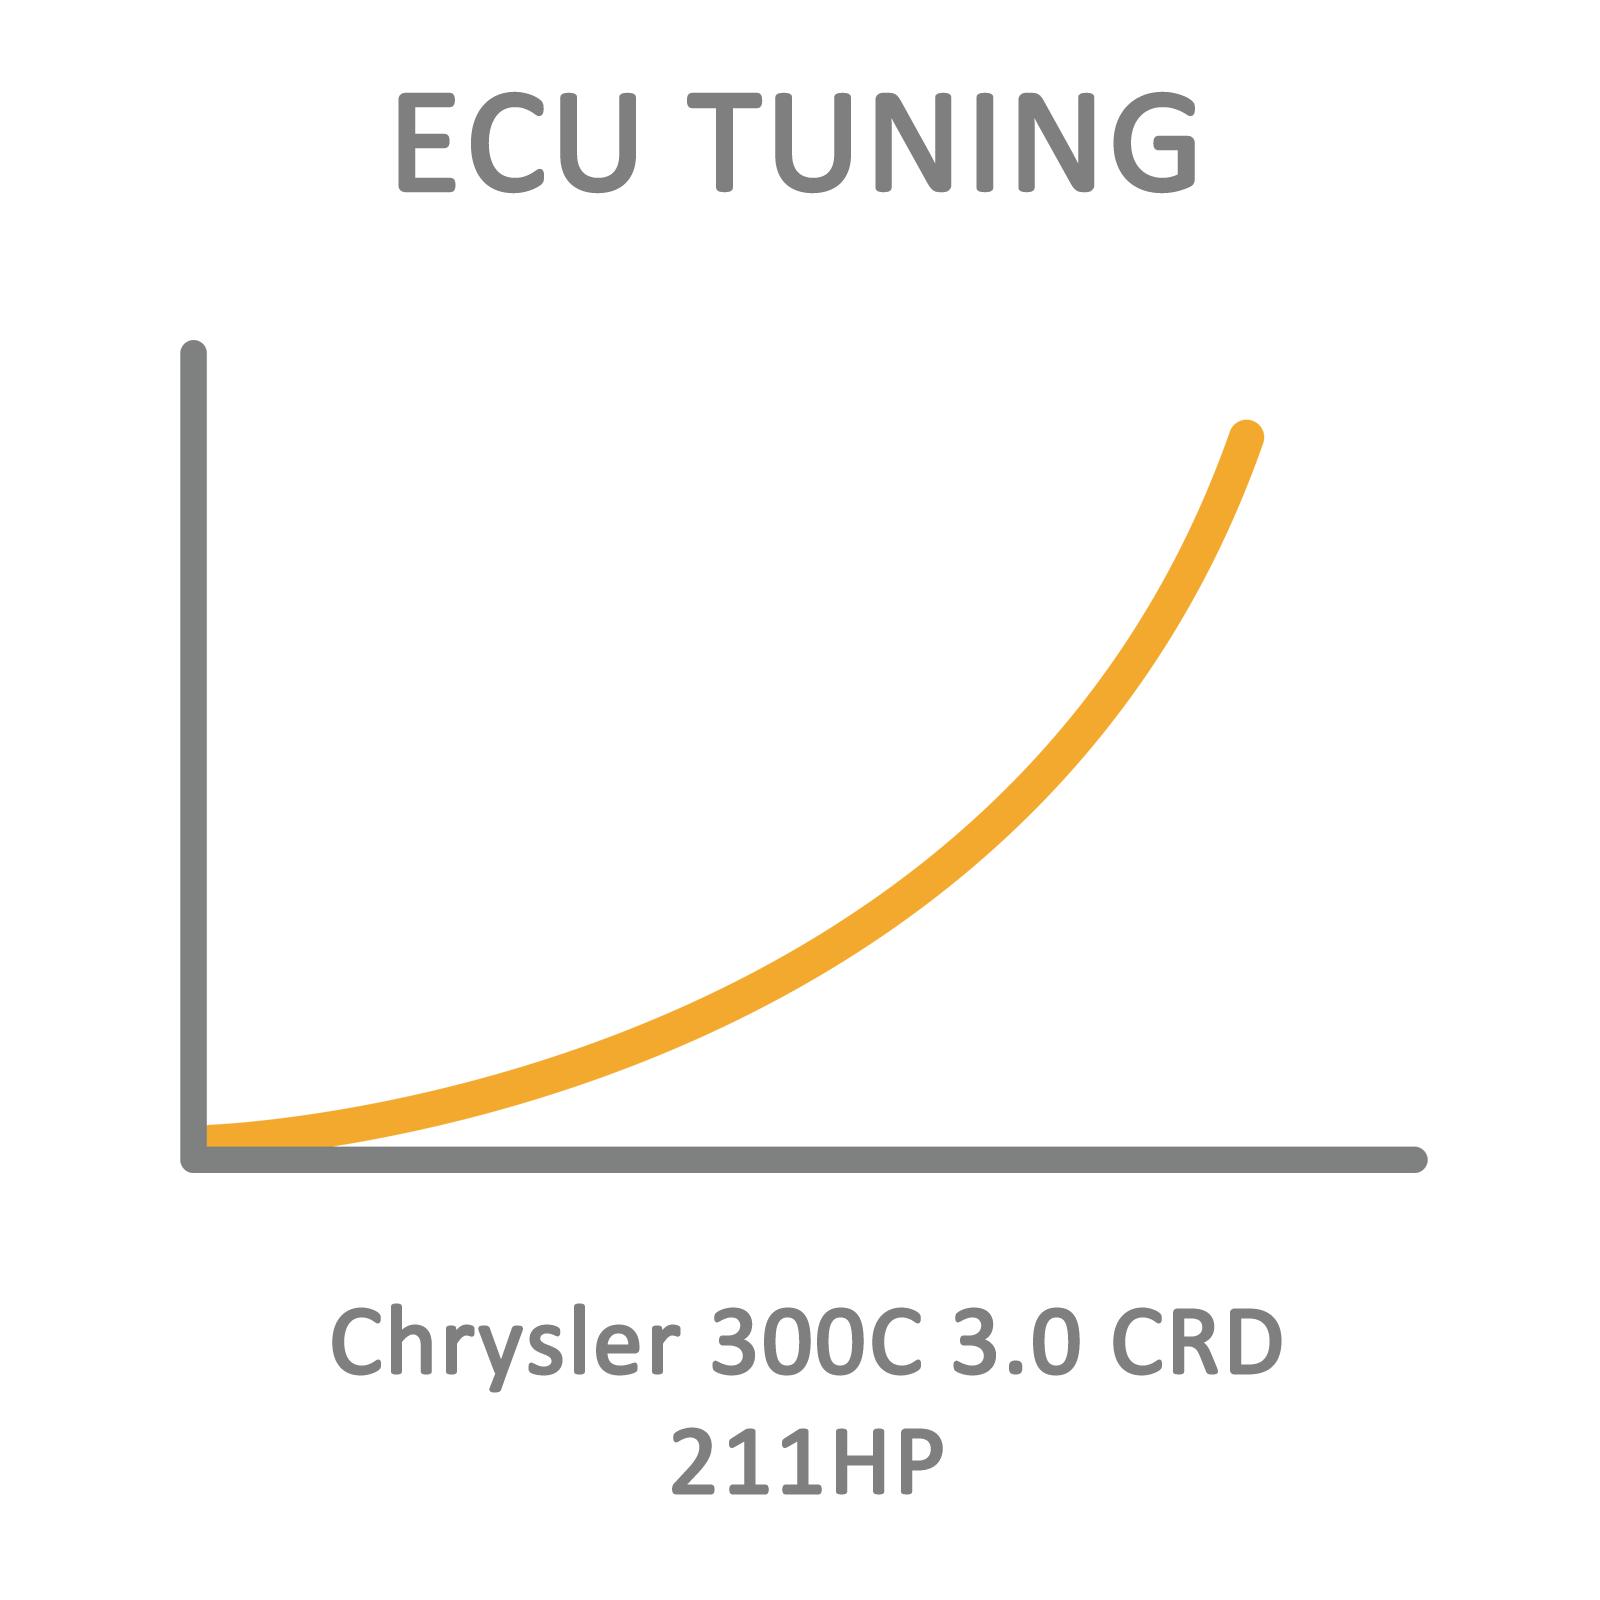 Chrysler 300C 3.0 CRD 211HP ECU Tuning Remapping Programming